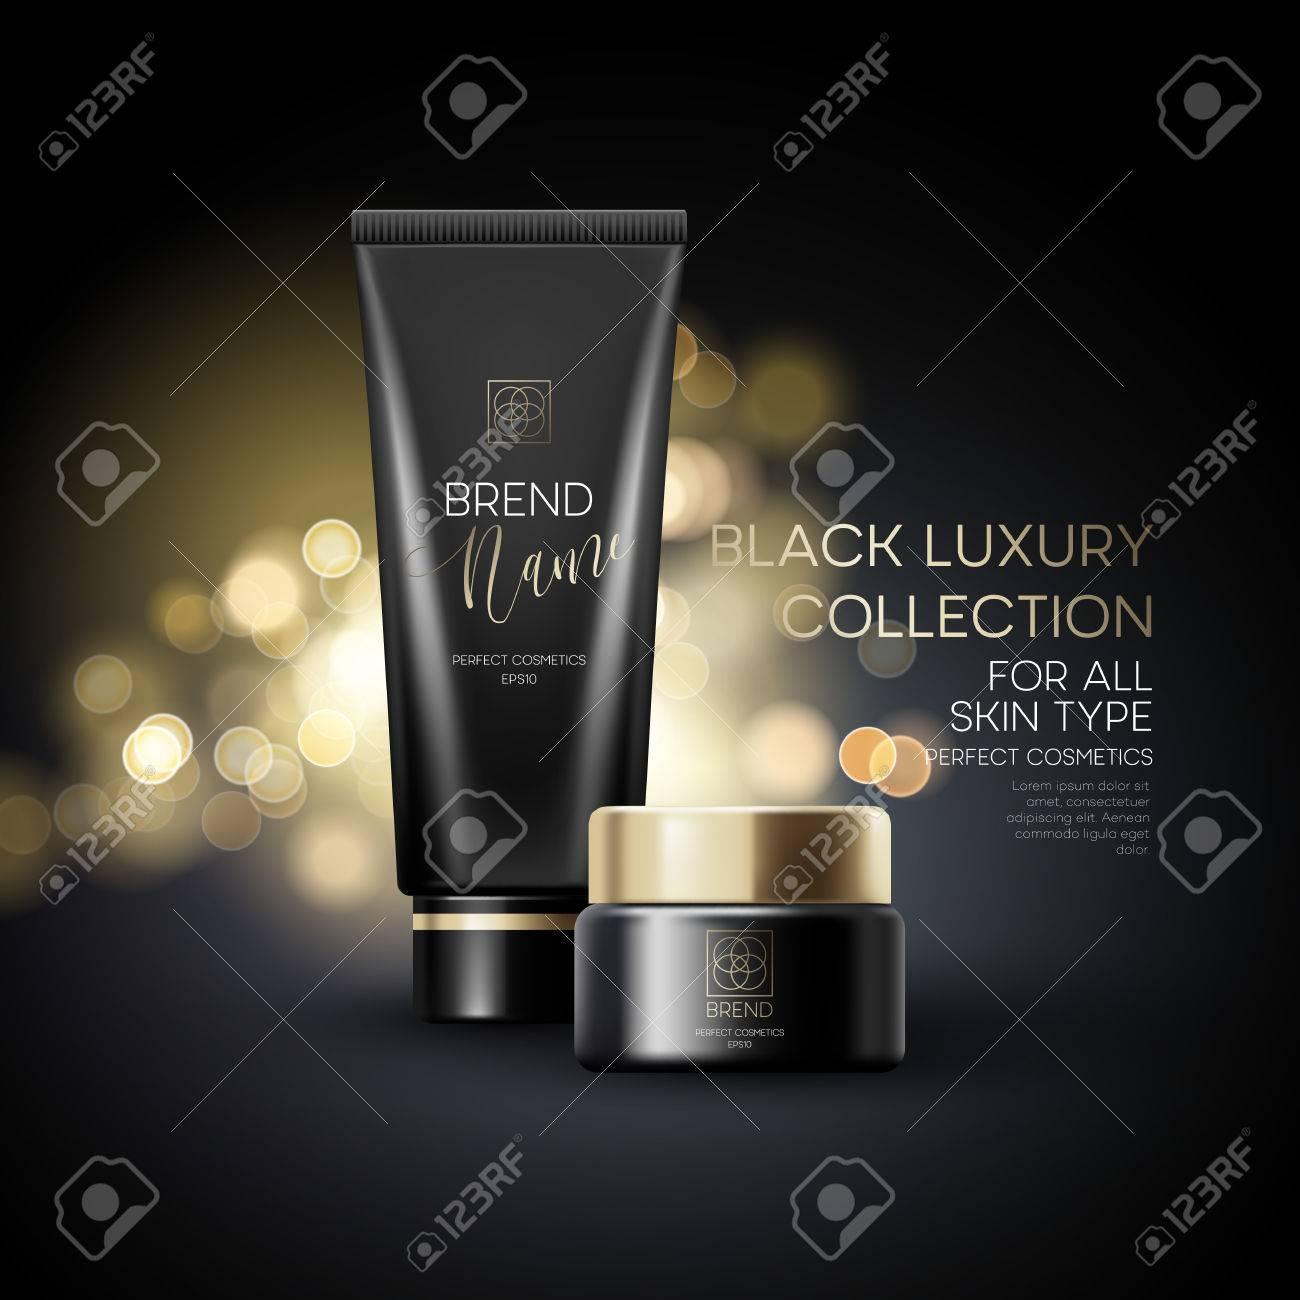 Design cosmetics product advertising on black background. Vector illustration - 69478571